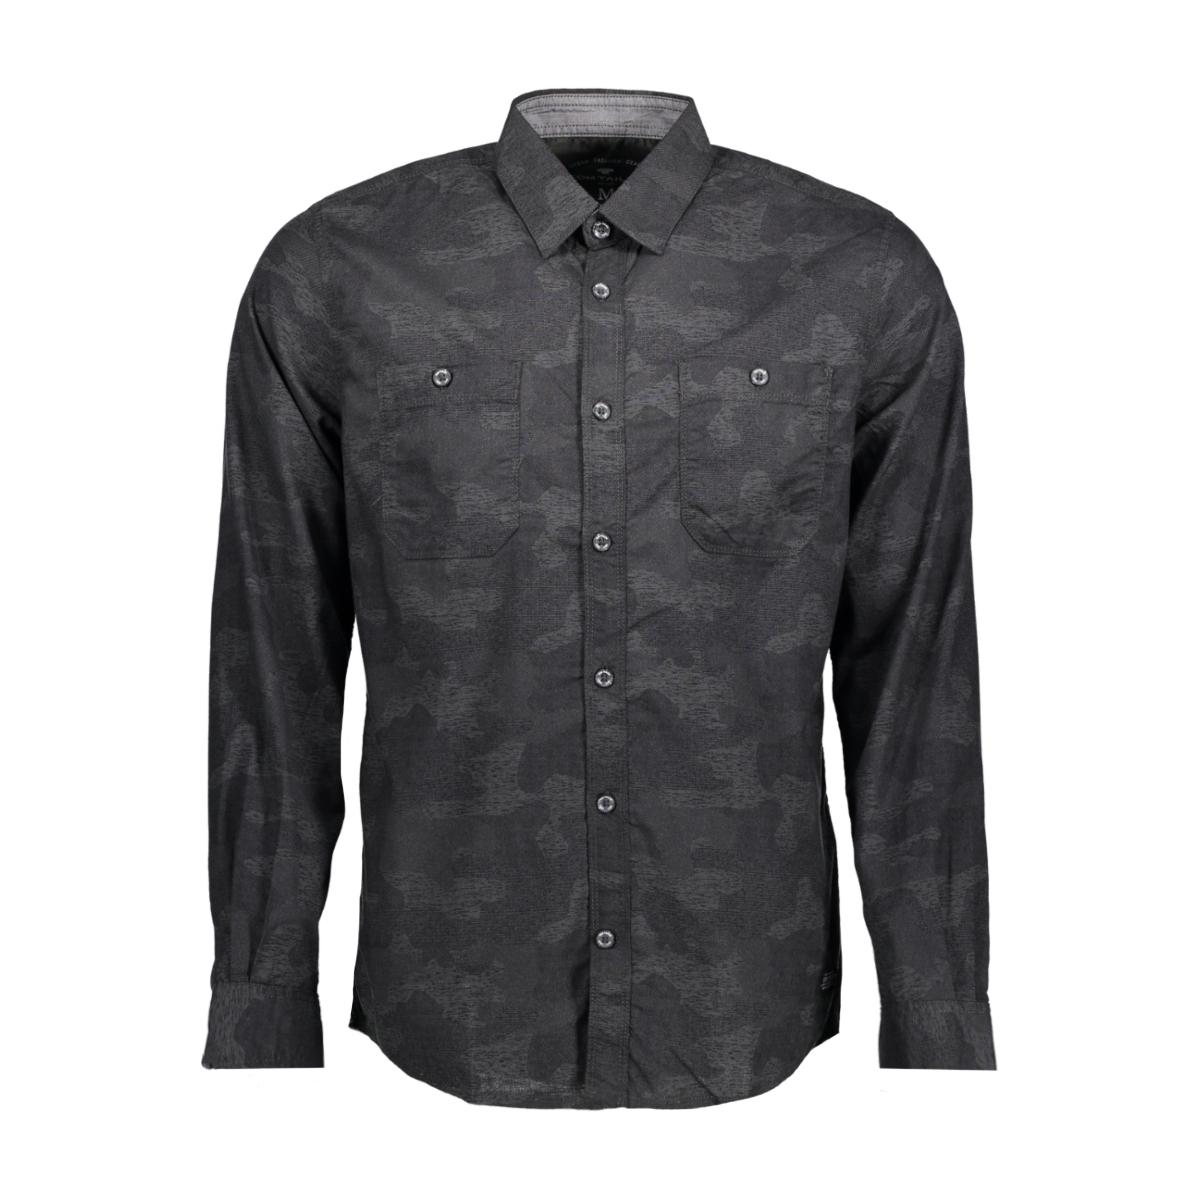 2033885.00.10 tom tailor overhemd 2550